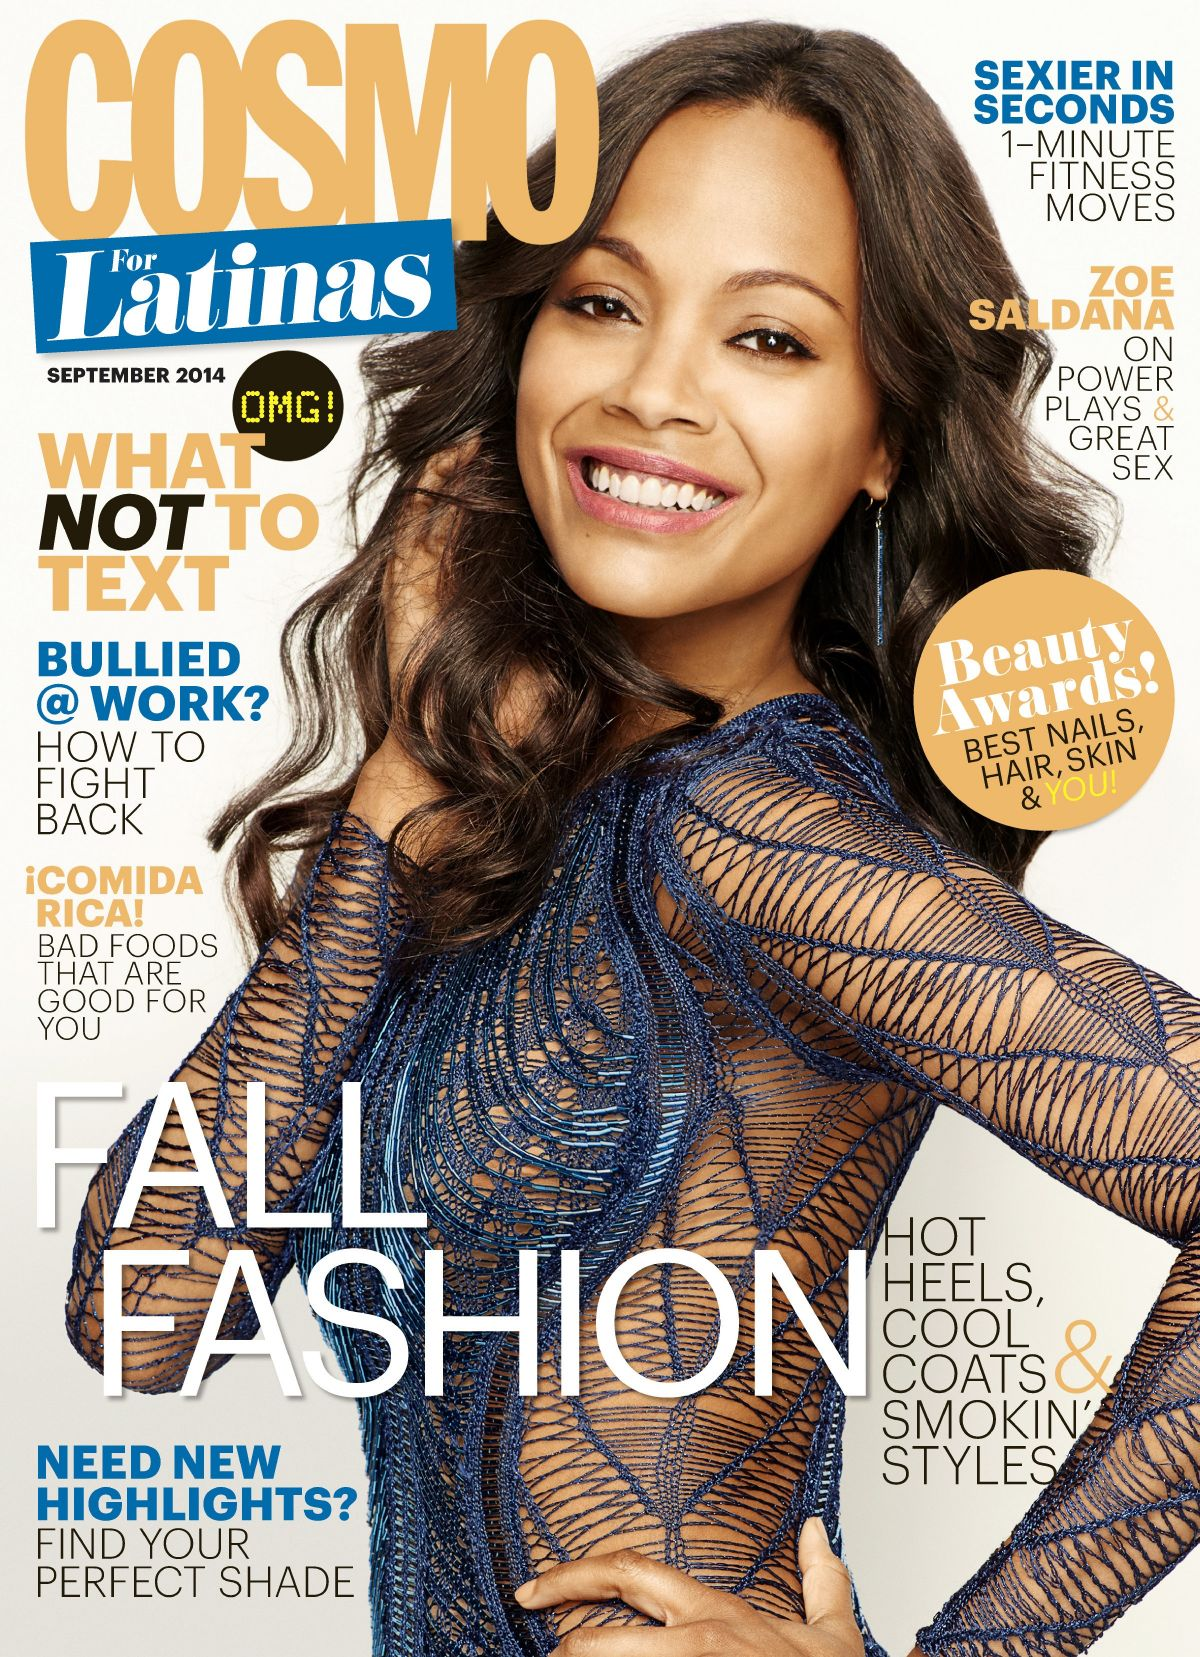 ZOE SALDANA on the Cover of Cosmopolitan for Matinas Magazine, September 2014 Issue